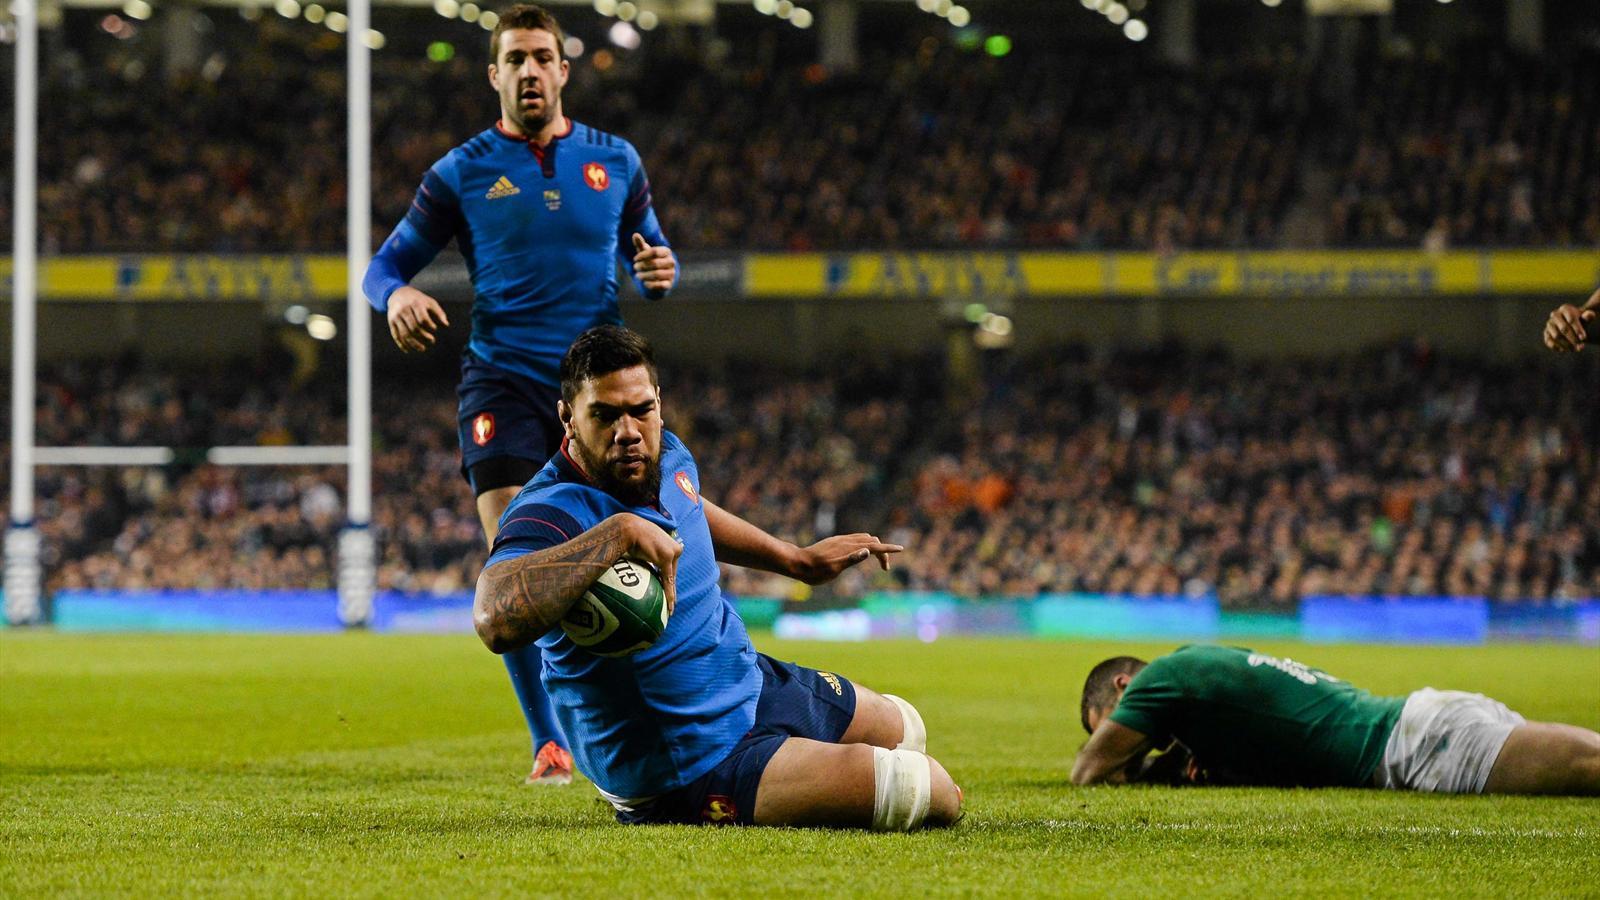 L'essai de Romain Taofifenua (XV de France) face à l'Irlande - 14 février 2015